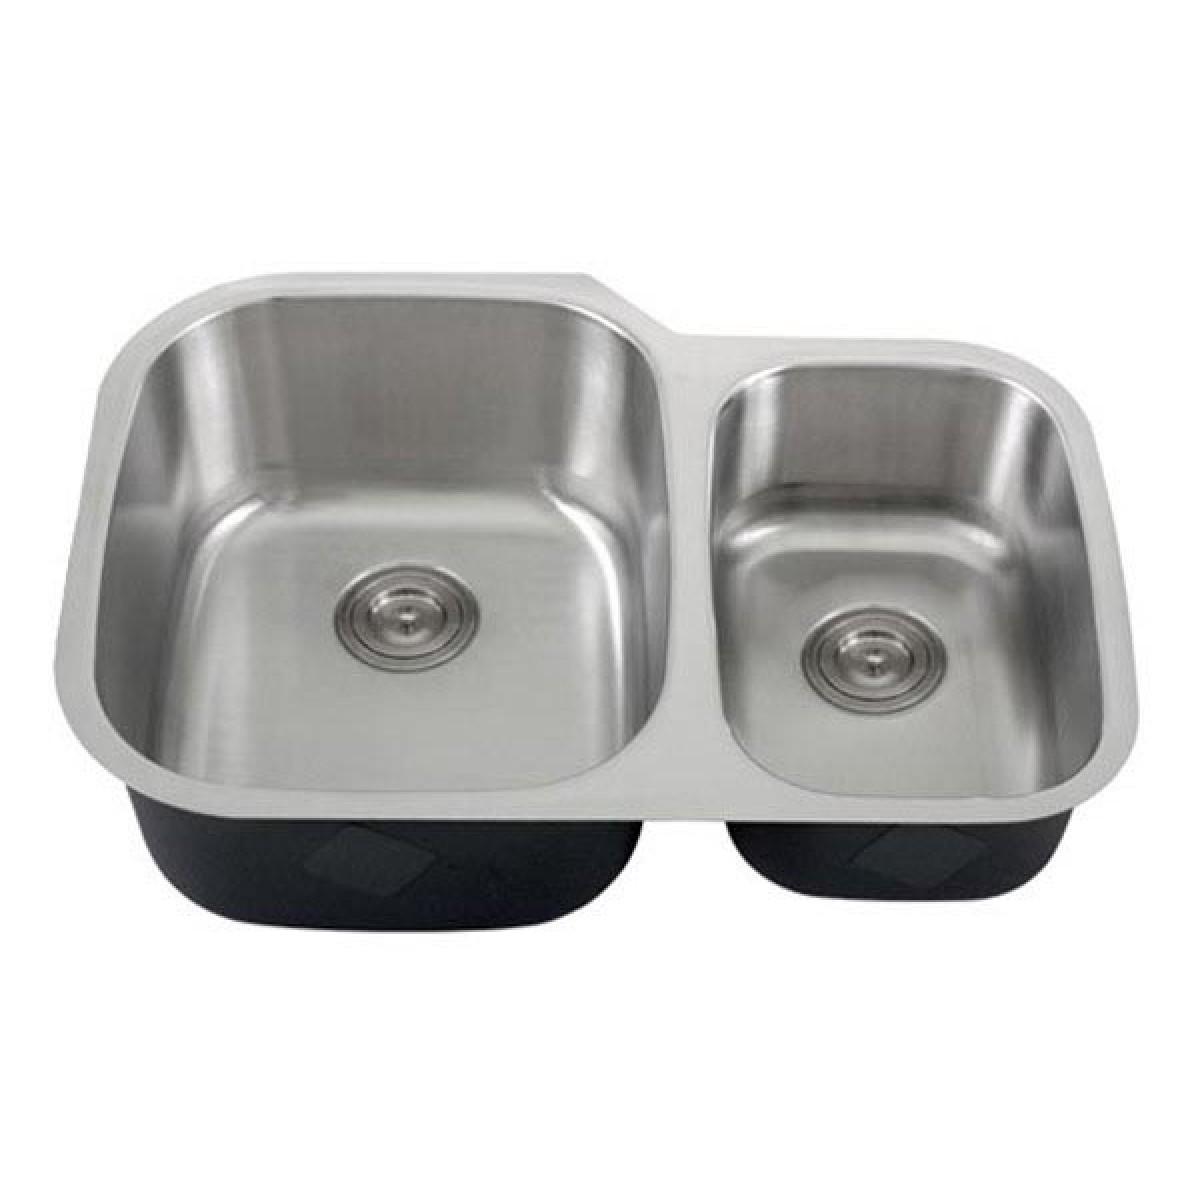 30 undermount kitchen sink wooden tables inch 18 gauge stainless steel 60 40 double